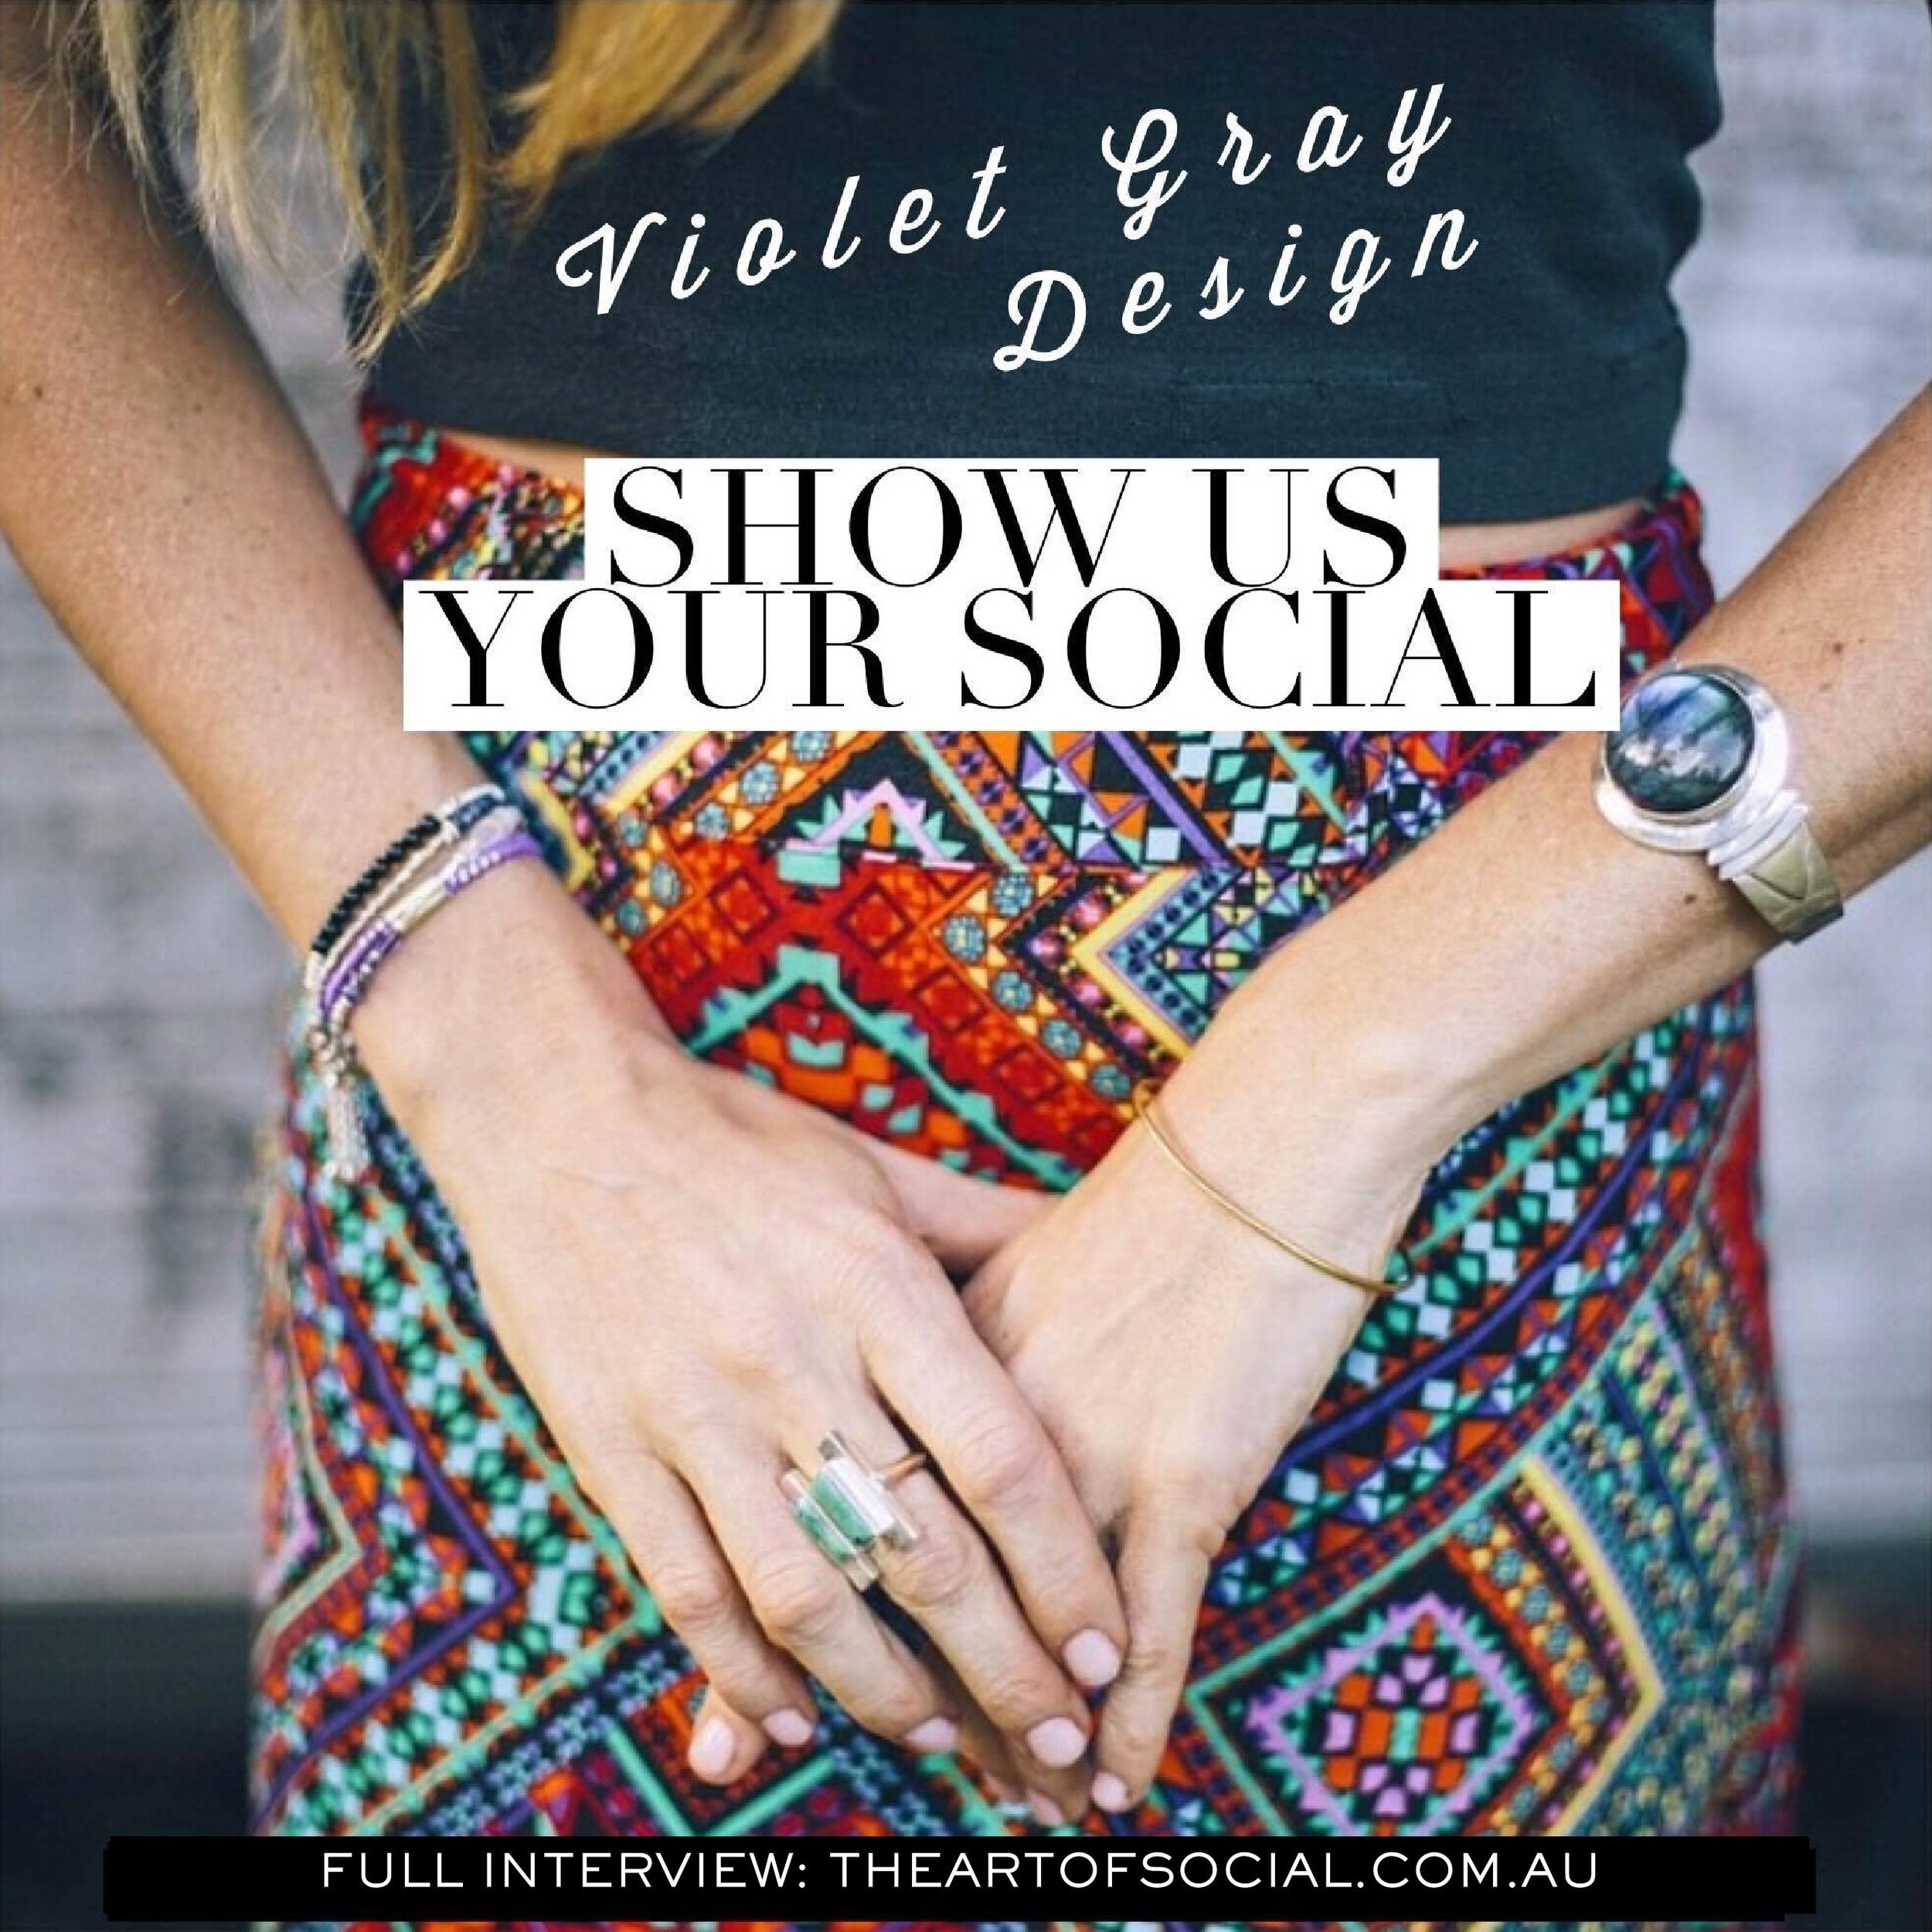 VioletGrayDesign-ShowUsYourSocial.jpeg